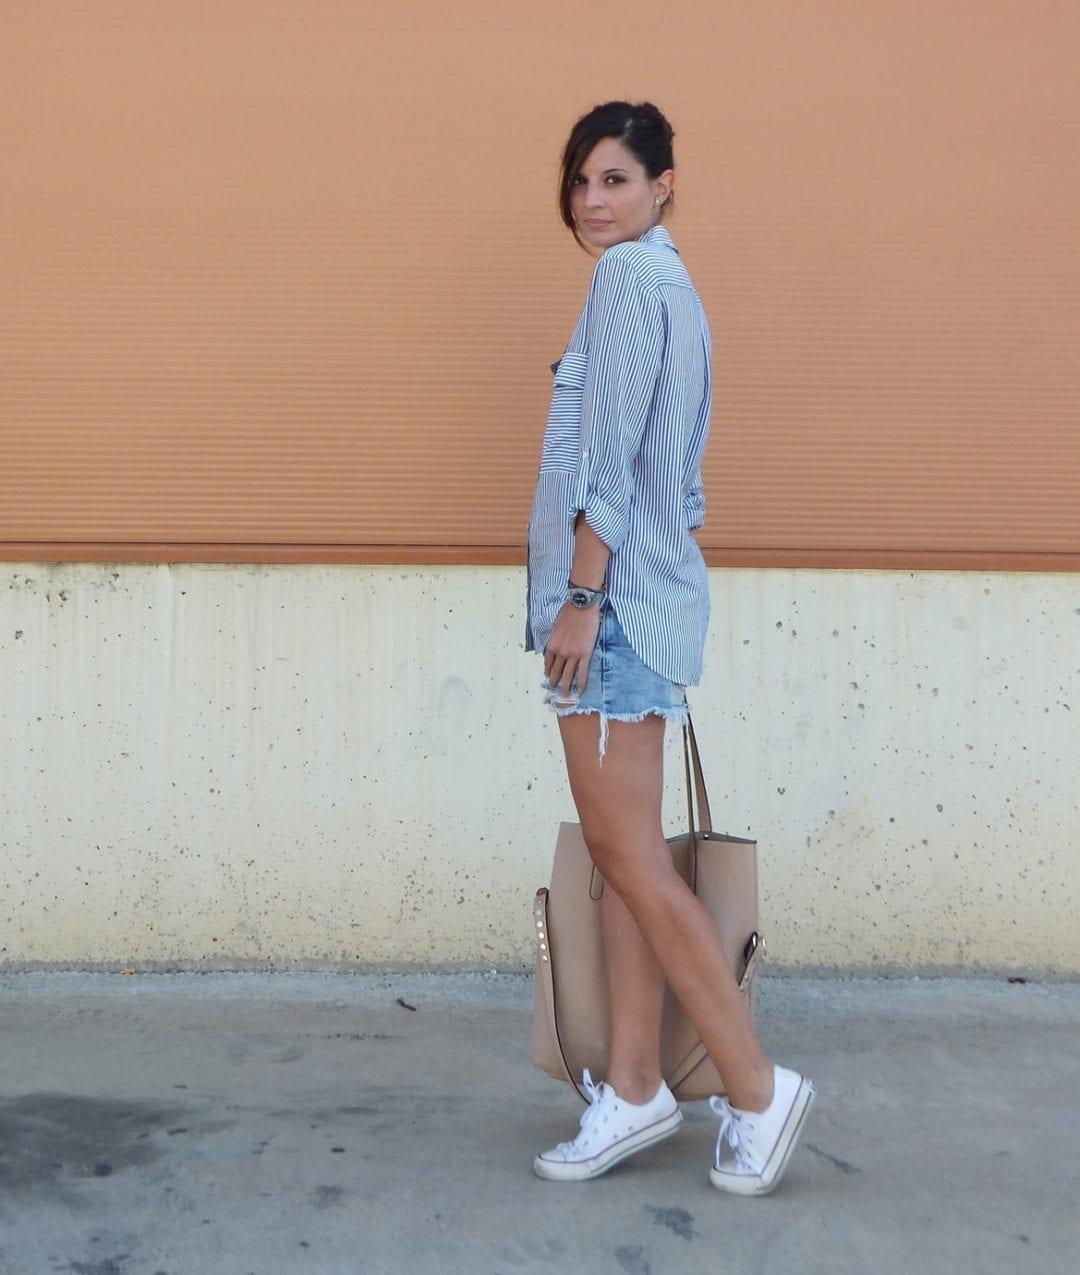 blogger de moda con look sport con camisa de rayas